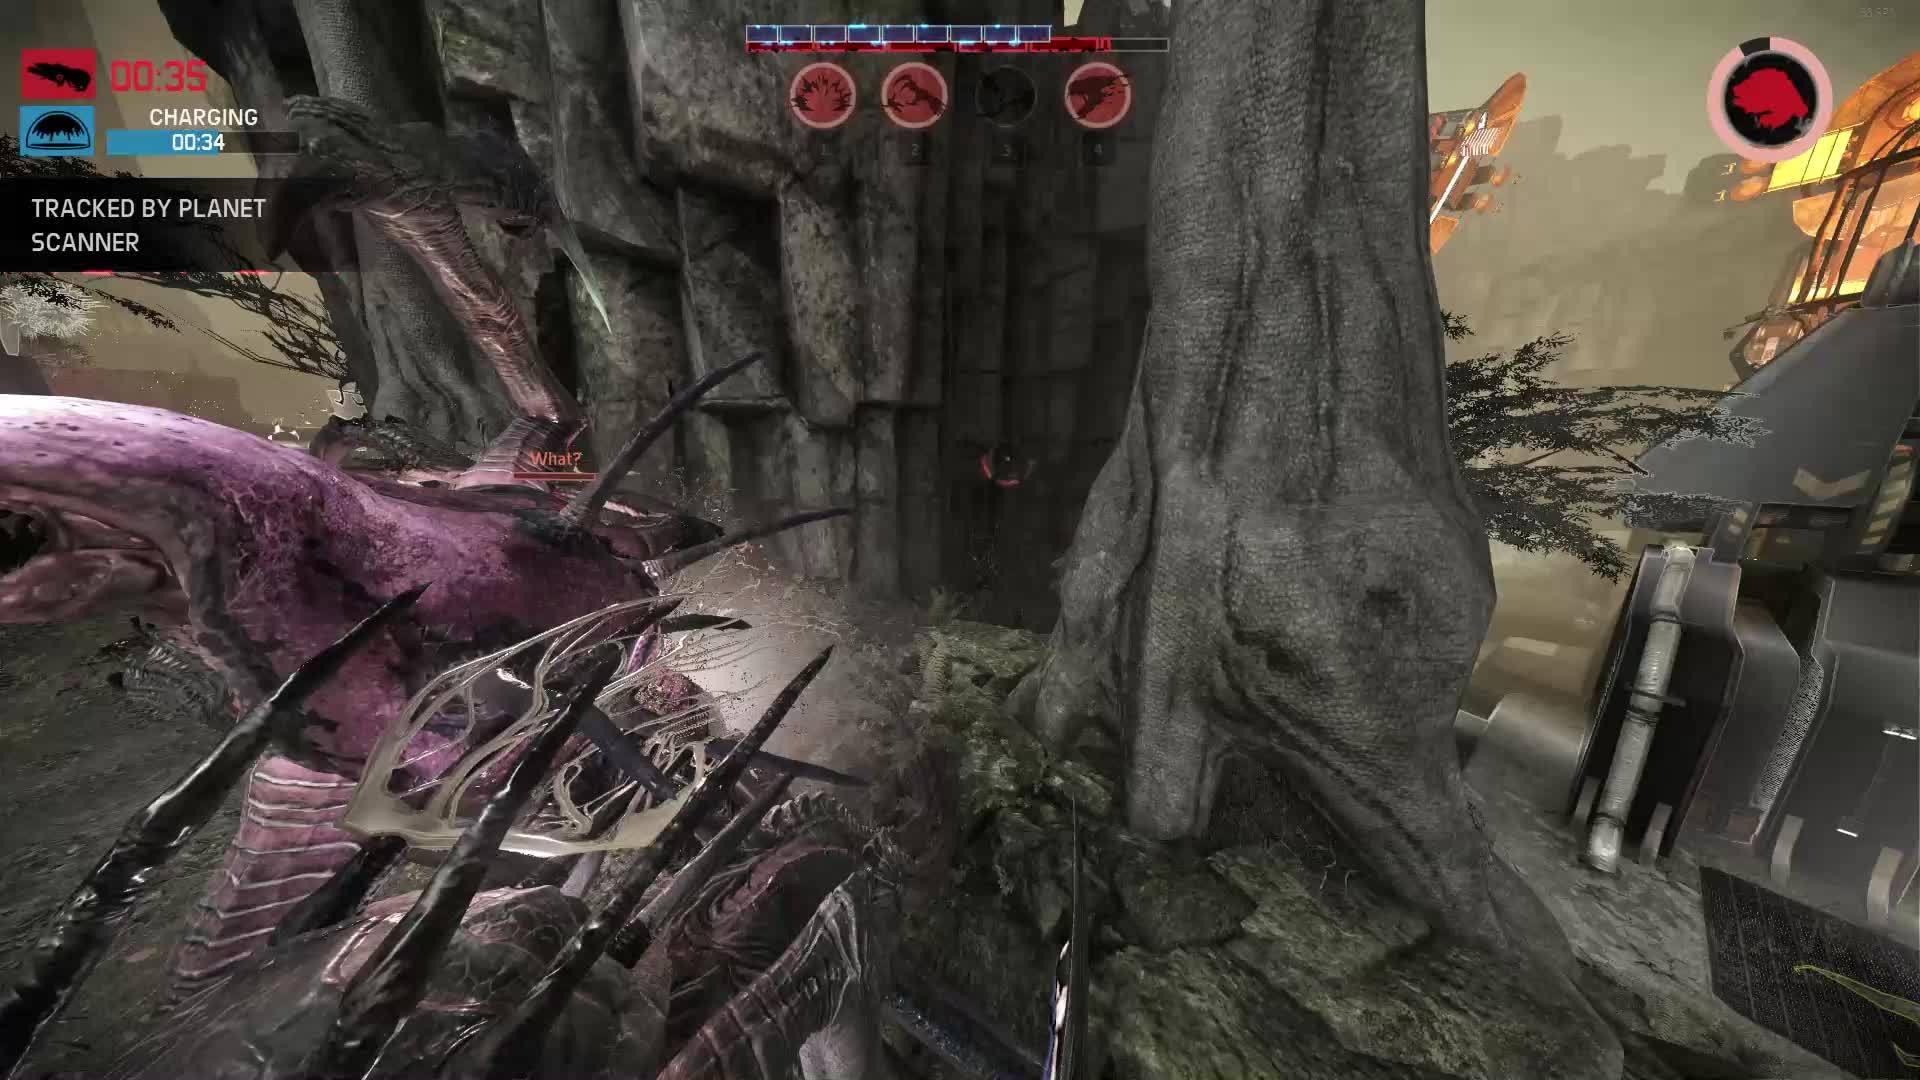 evolve, evolvegame, wraith, Traversal Glitch on Wraith GIFs